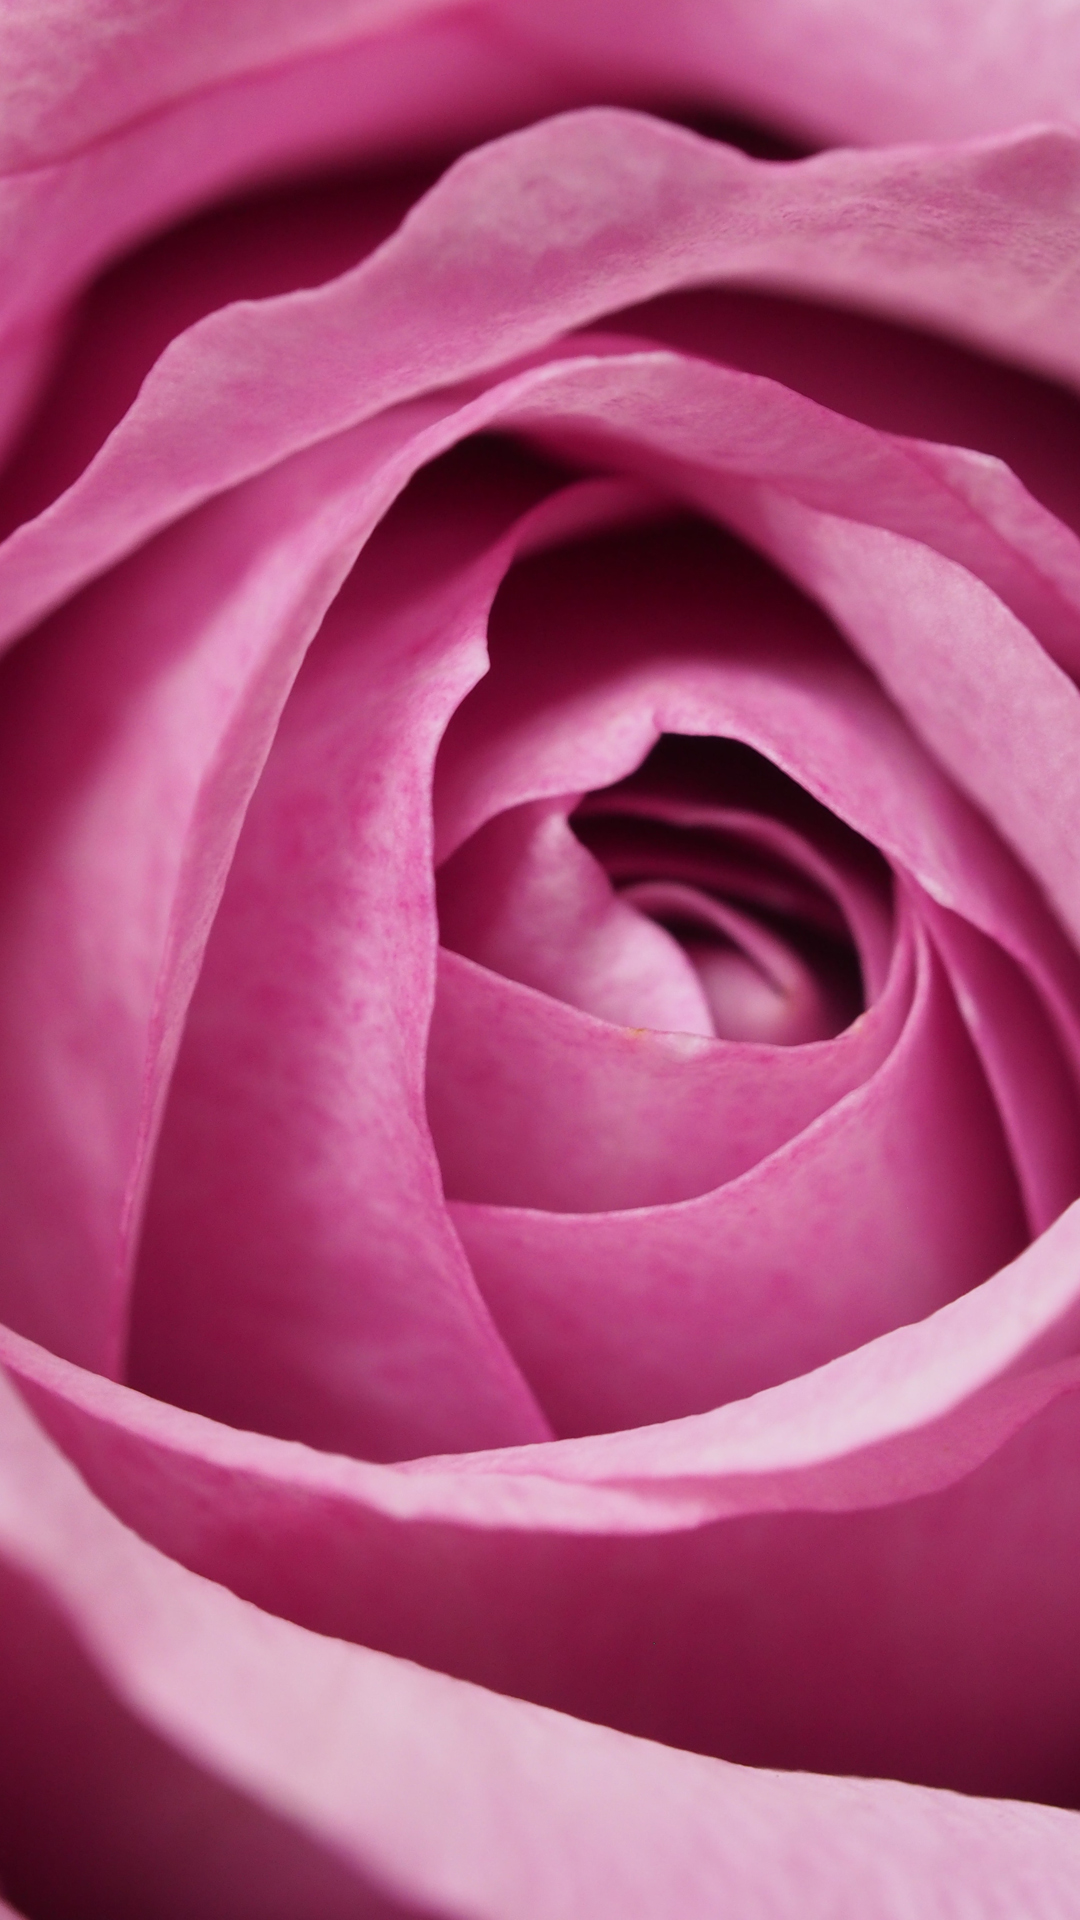 pink rose background